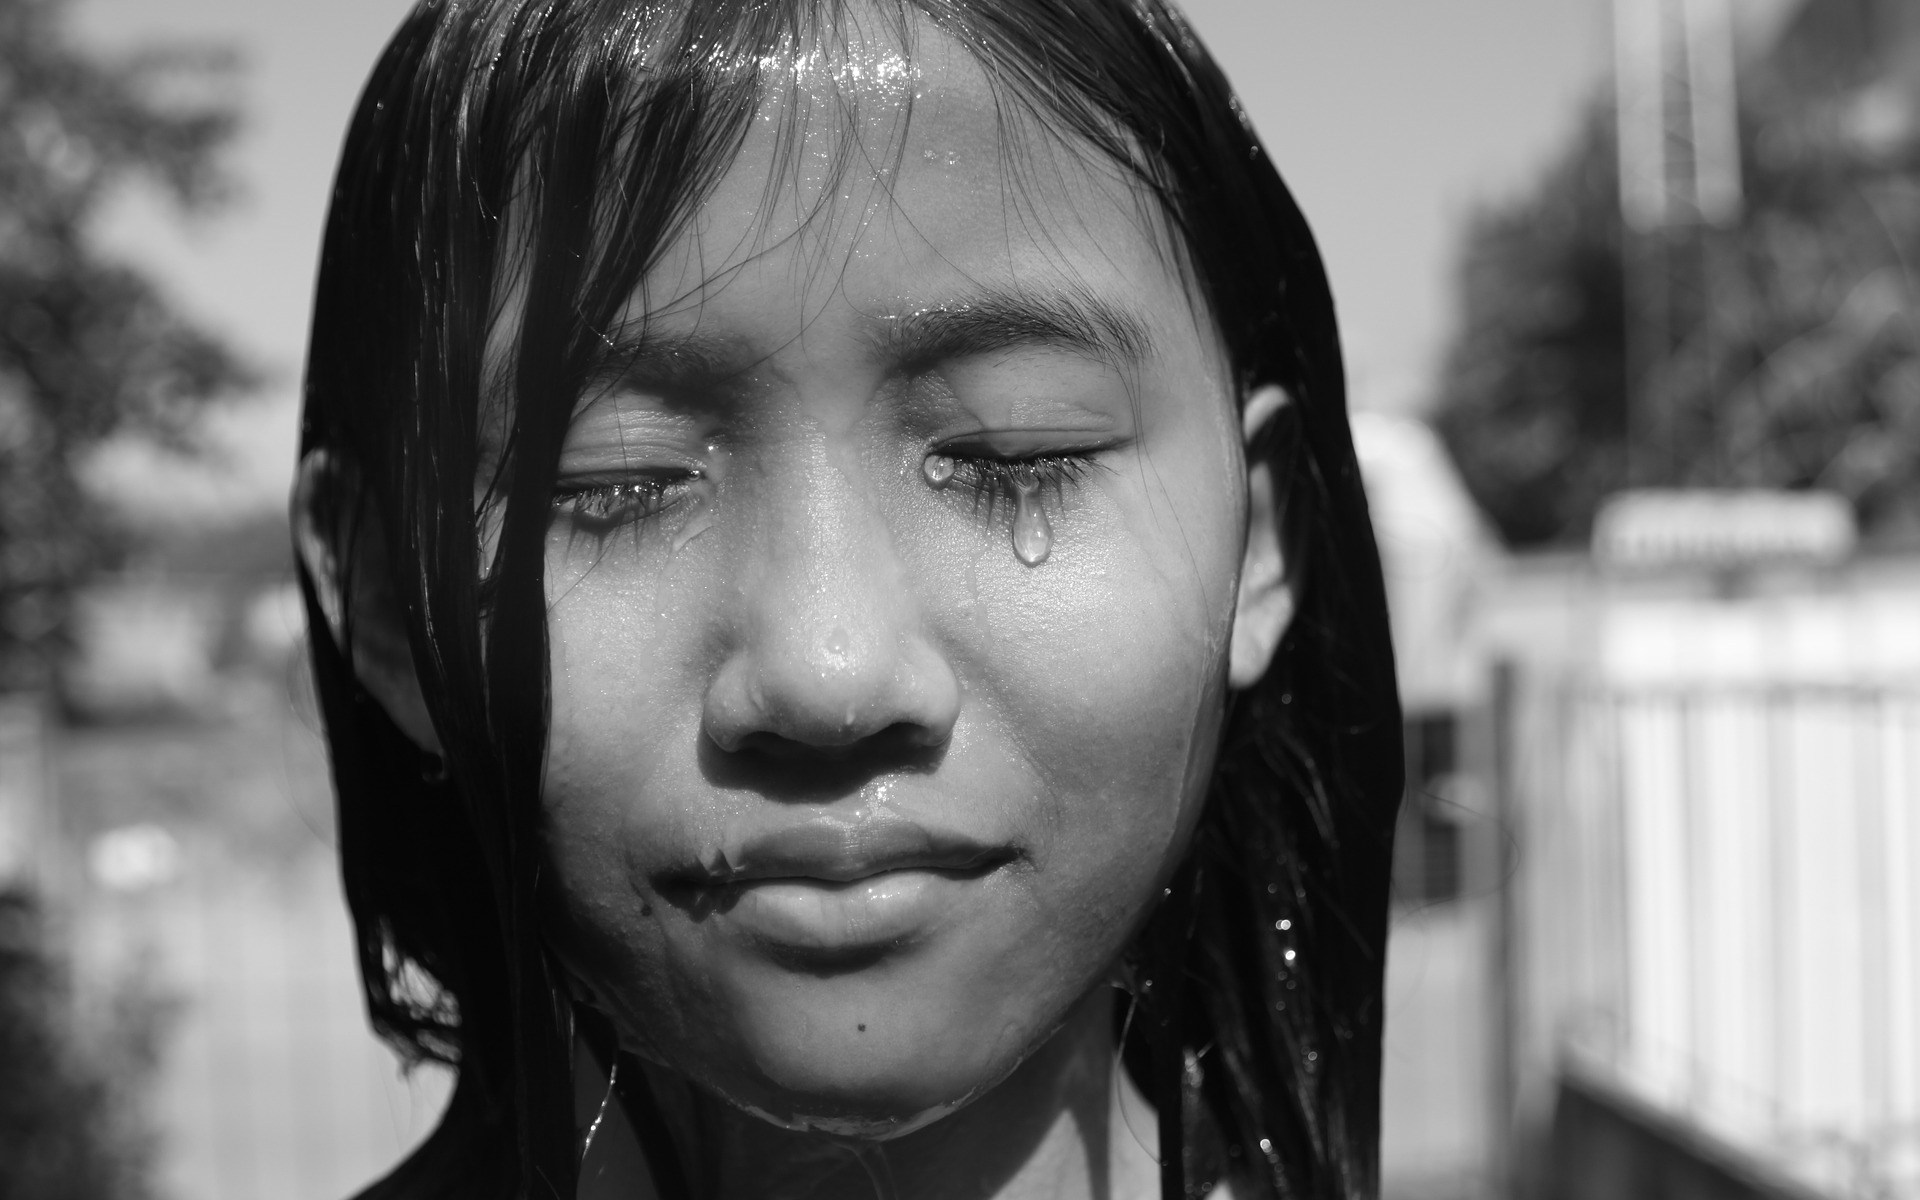 la parola piangere - G. Rodari